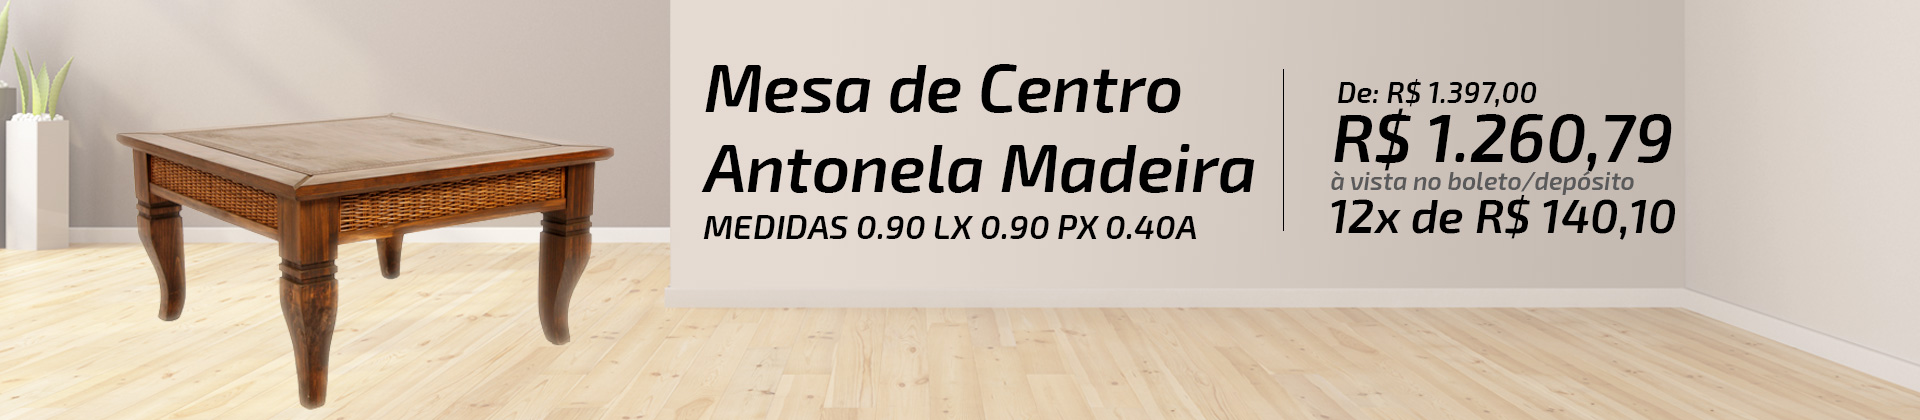 MESA DE CENTRO ANTONELA MADEIRA